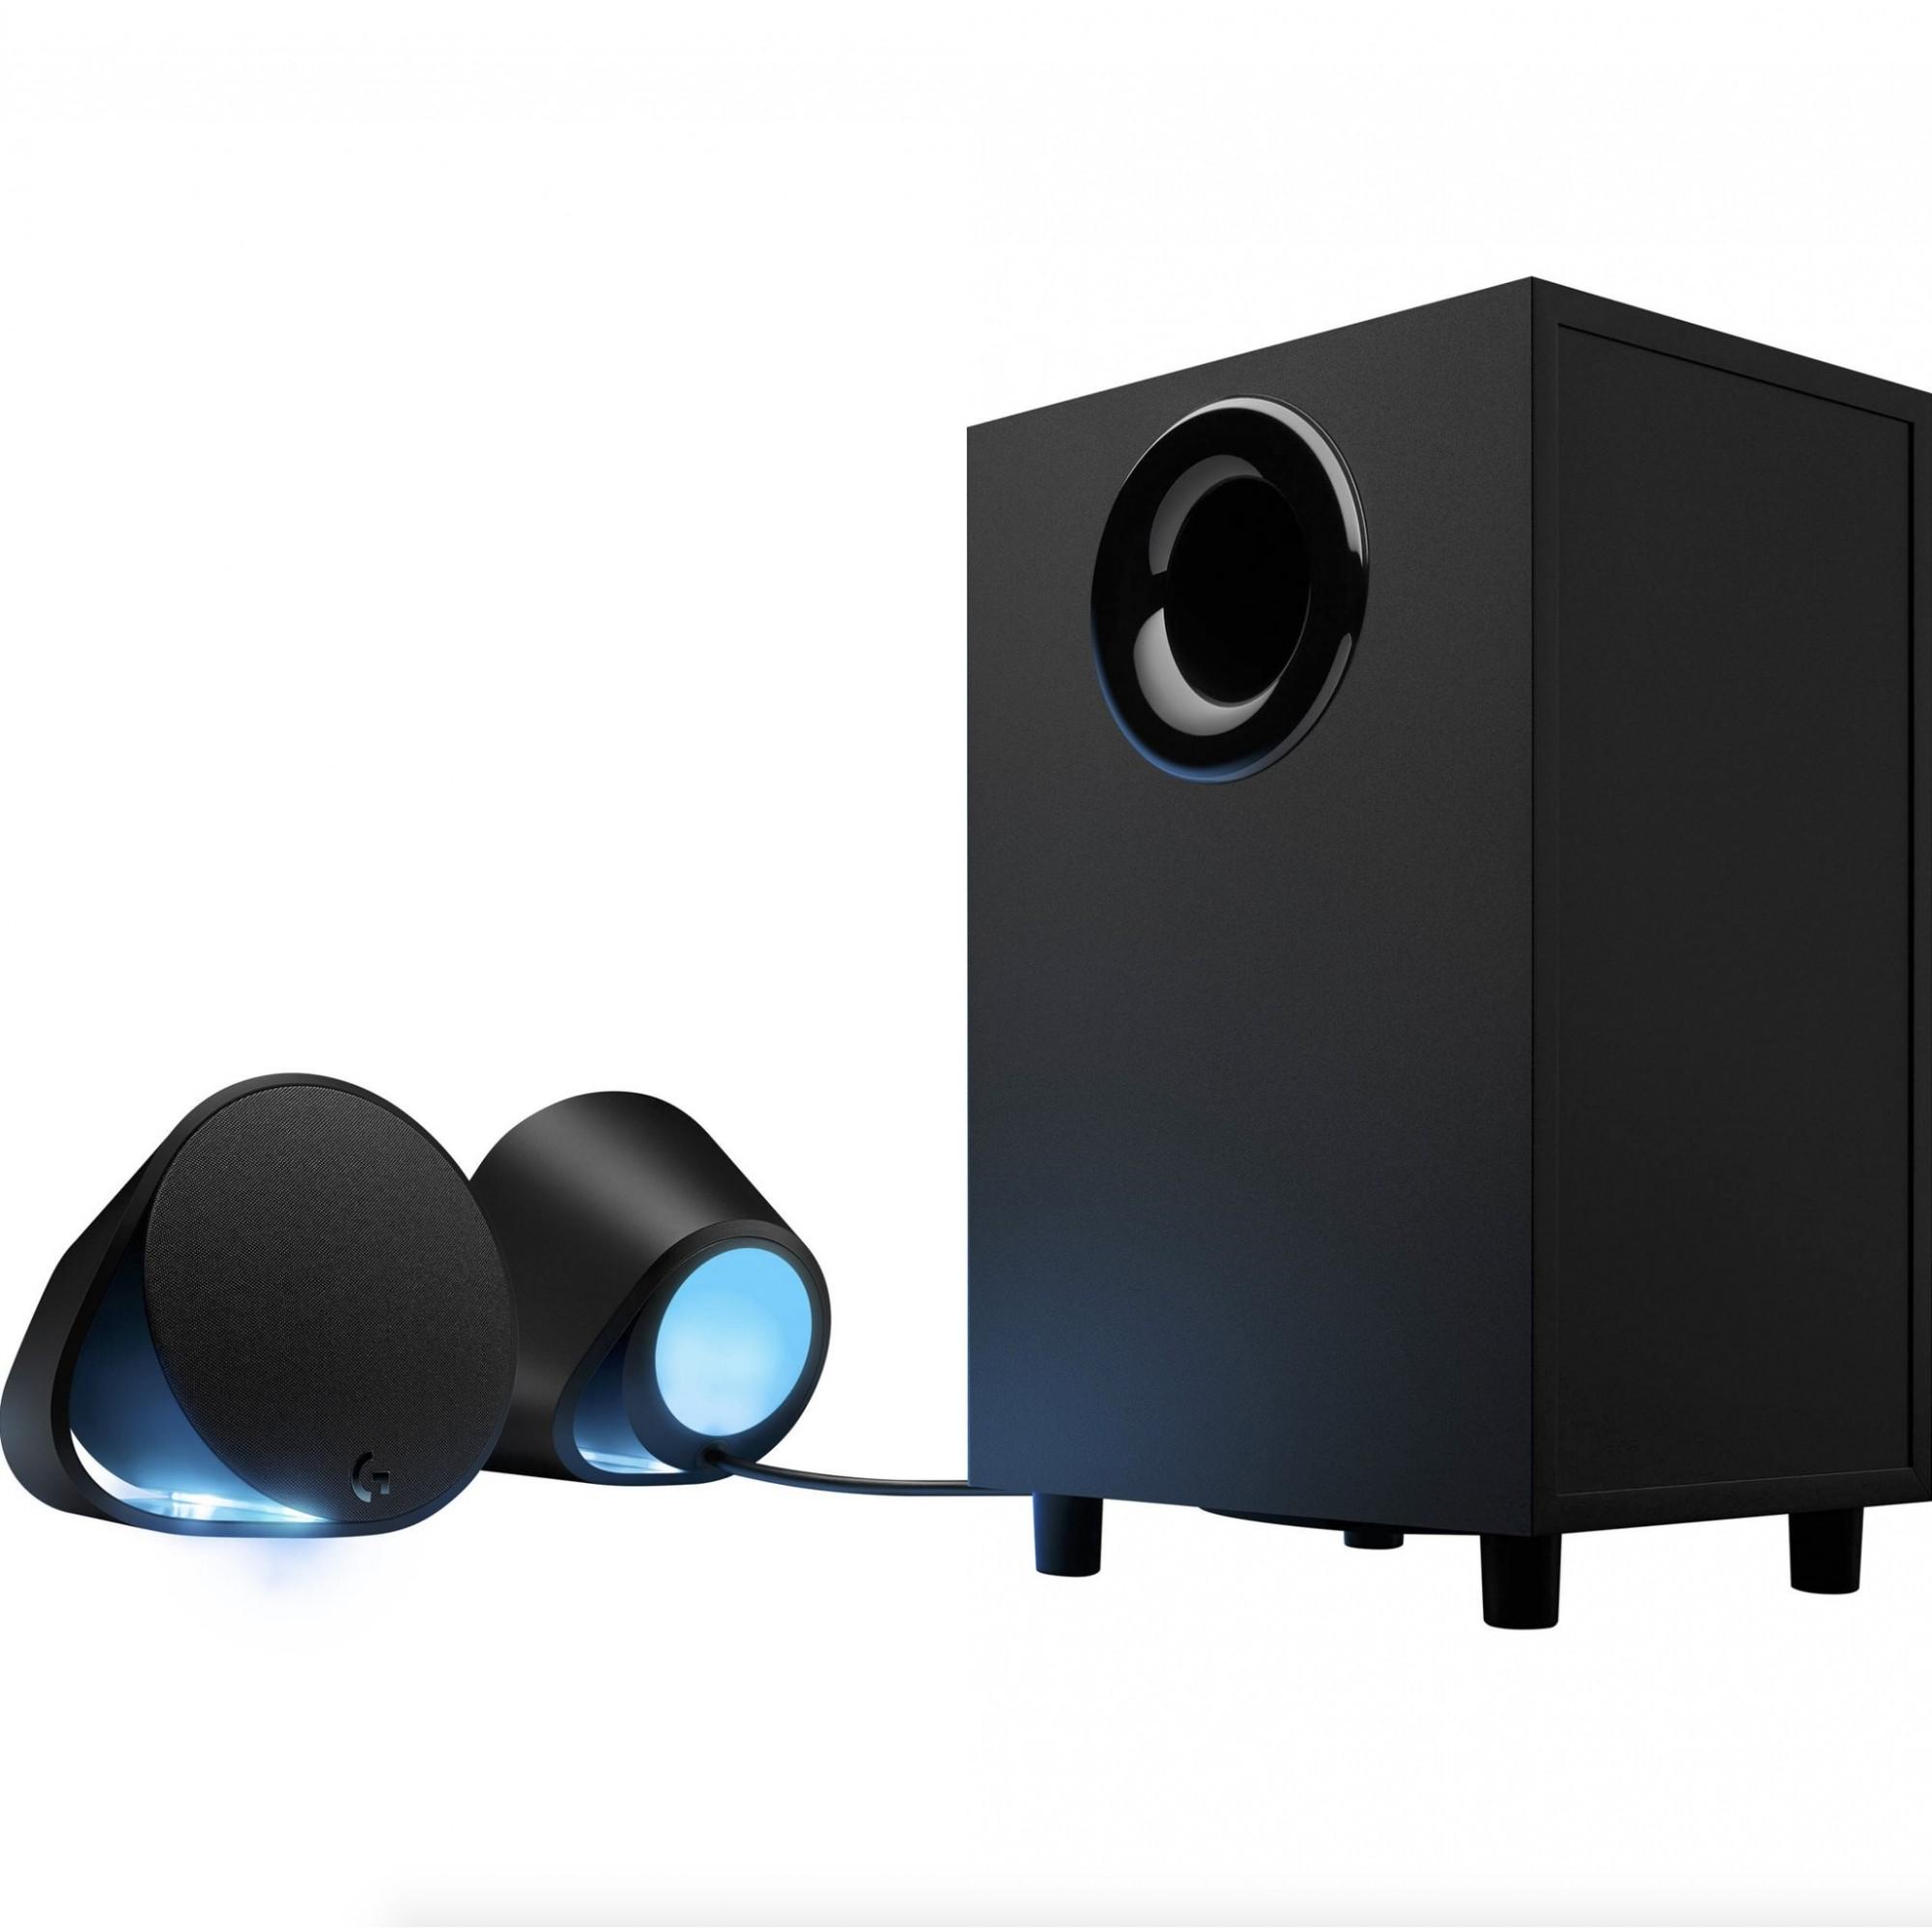 Caixa de Som Gamer Logitech G560 DTS:X Ultra Surround 240W RGB Lightsync USB/P3/Bluetooth - 980-001300